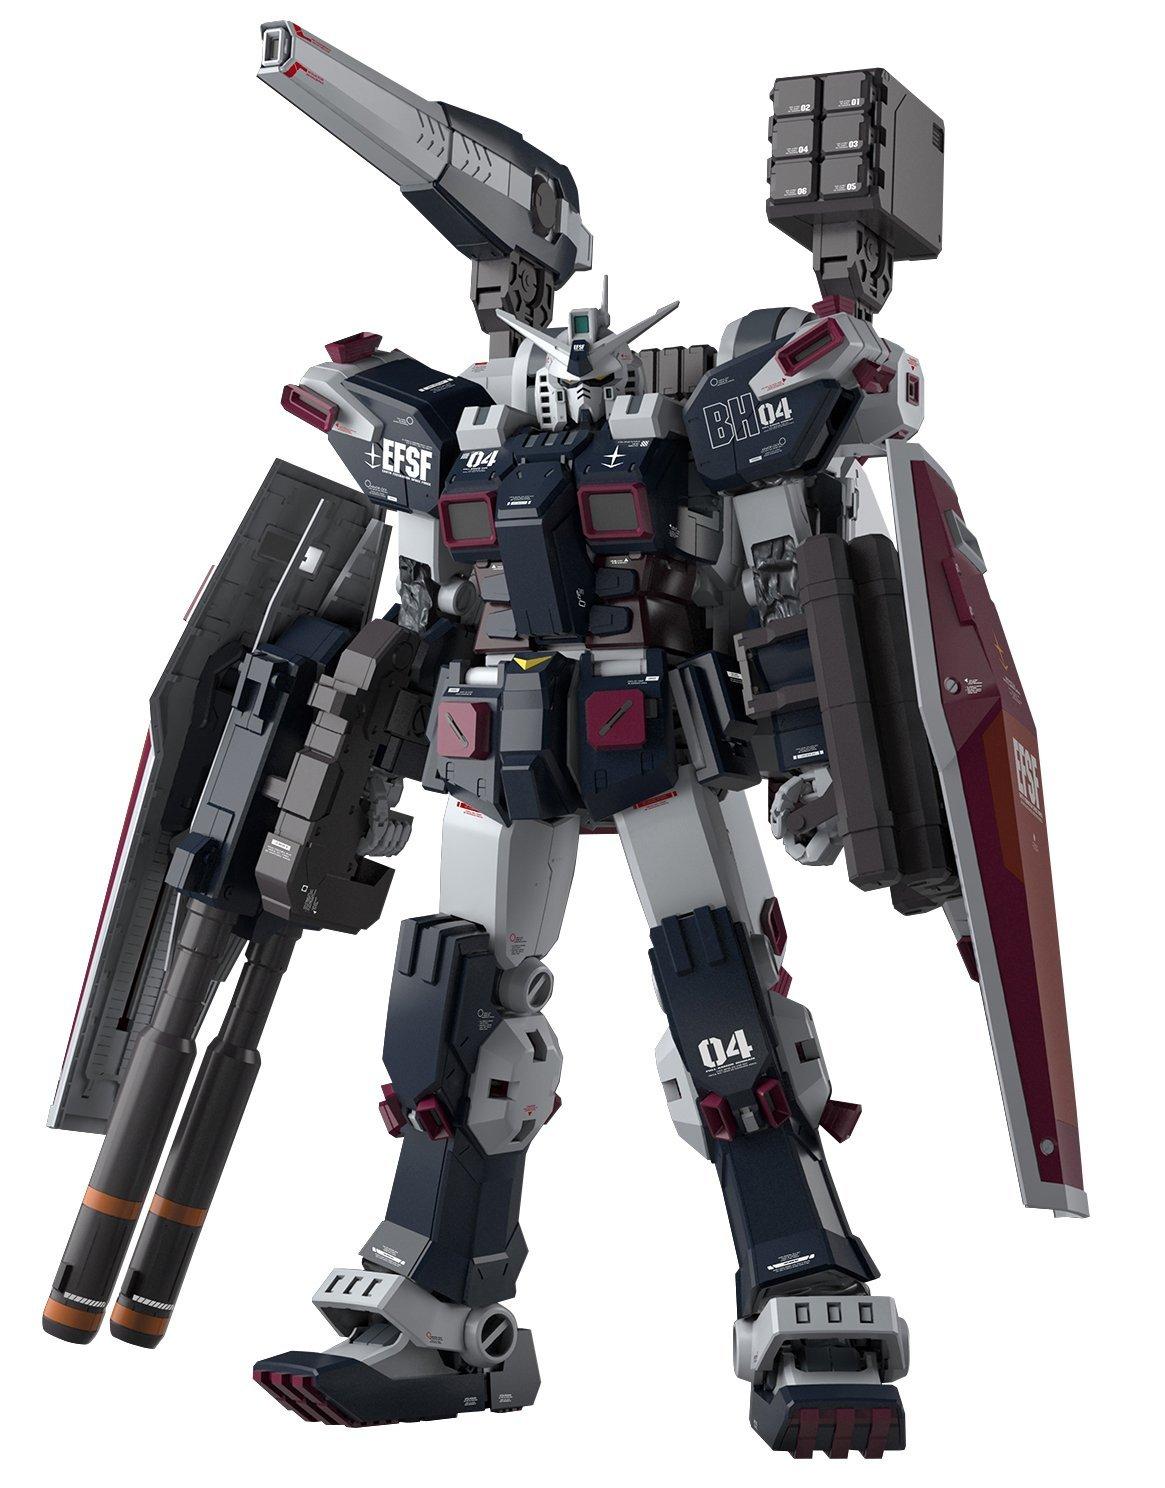 MG 1/100『フルアーマー・ガンダム Ver.Ka(GUNDAM THUNDERBOLT版)』機動戦士ガンダム サンダーボルト プラモデル-004